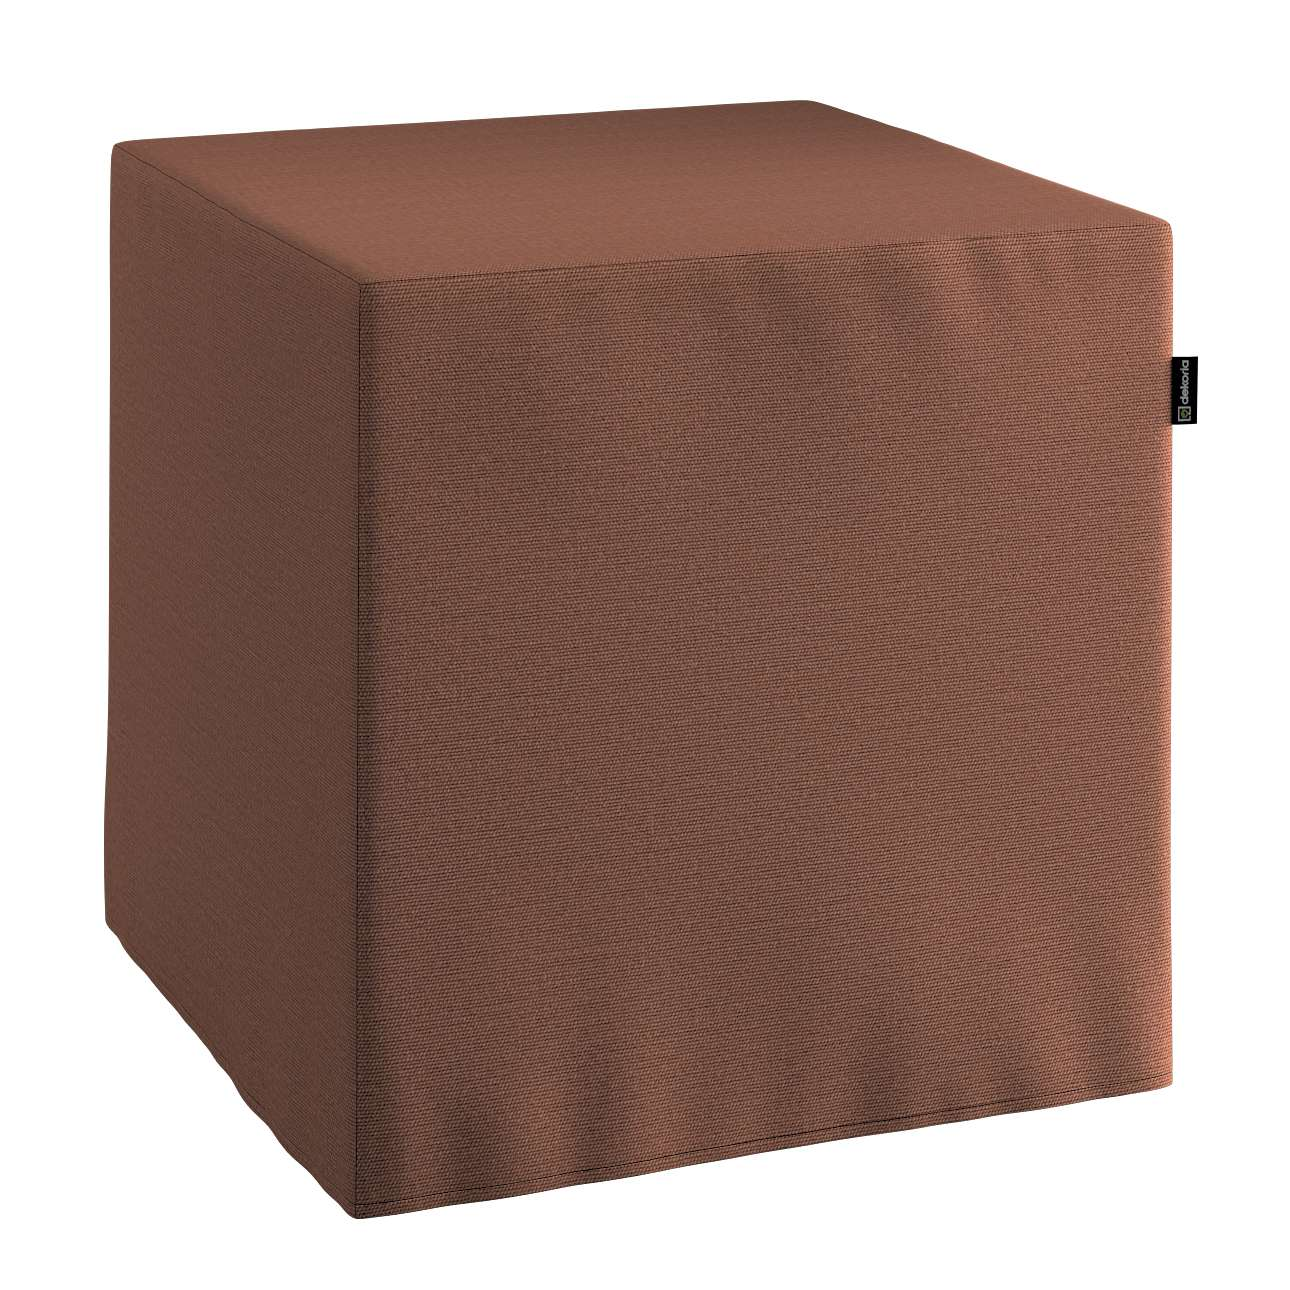 Sedák Cube - kostka pevná 40x40x40 v kolekci Loneta, látka: 133-09